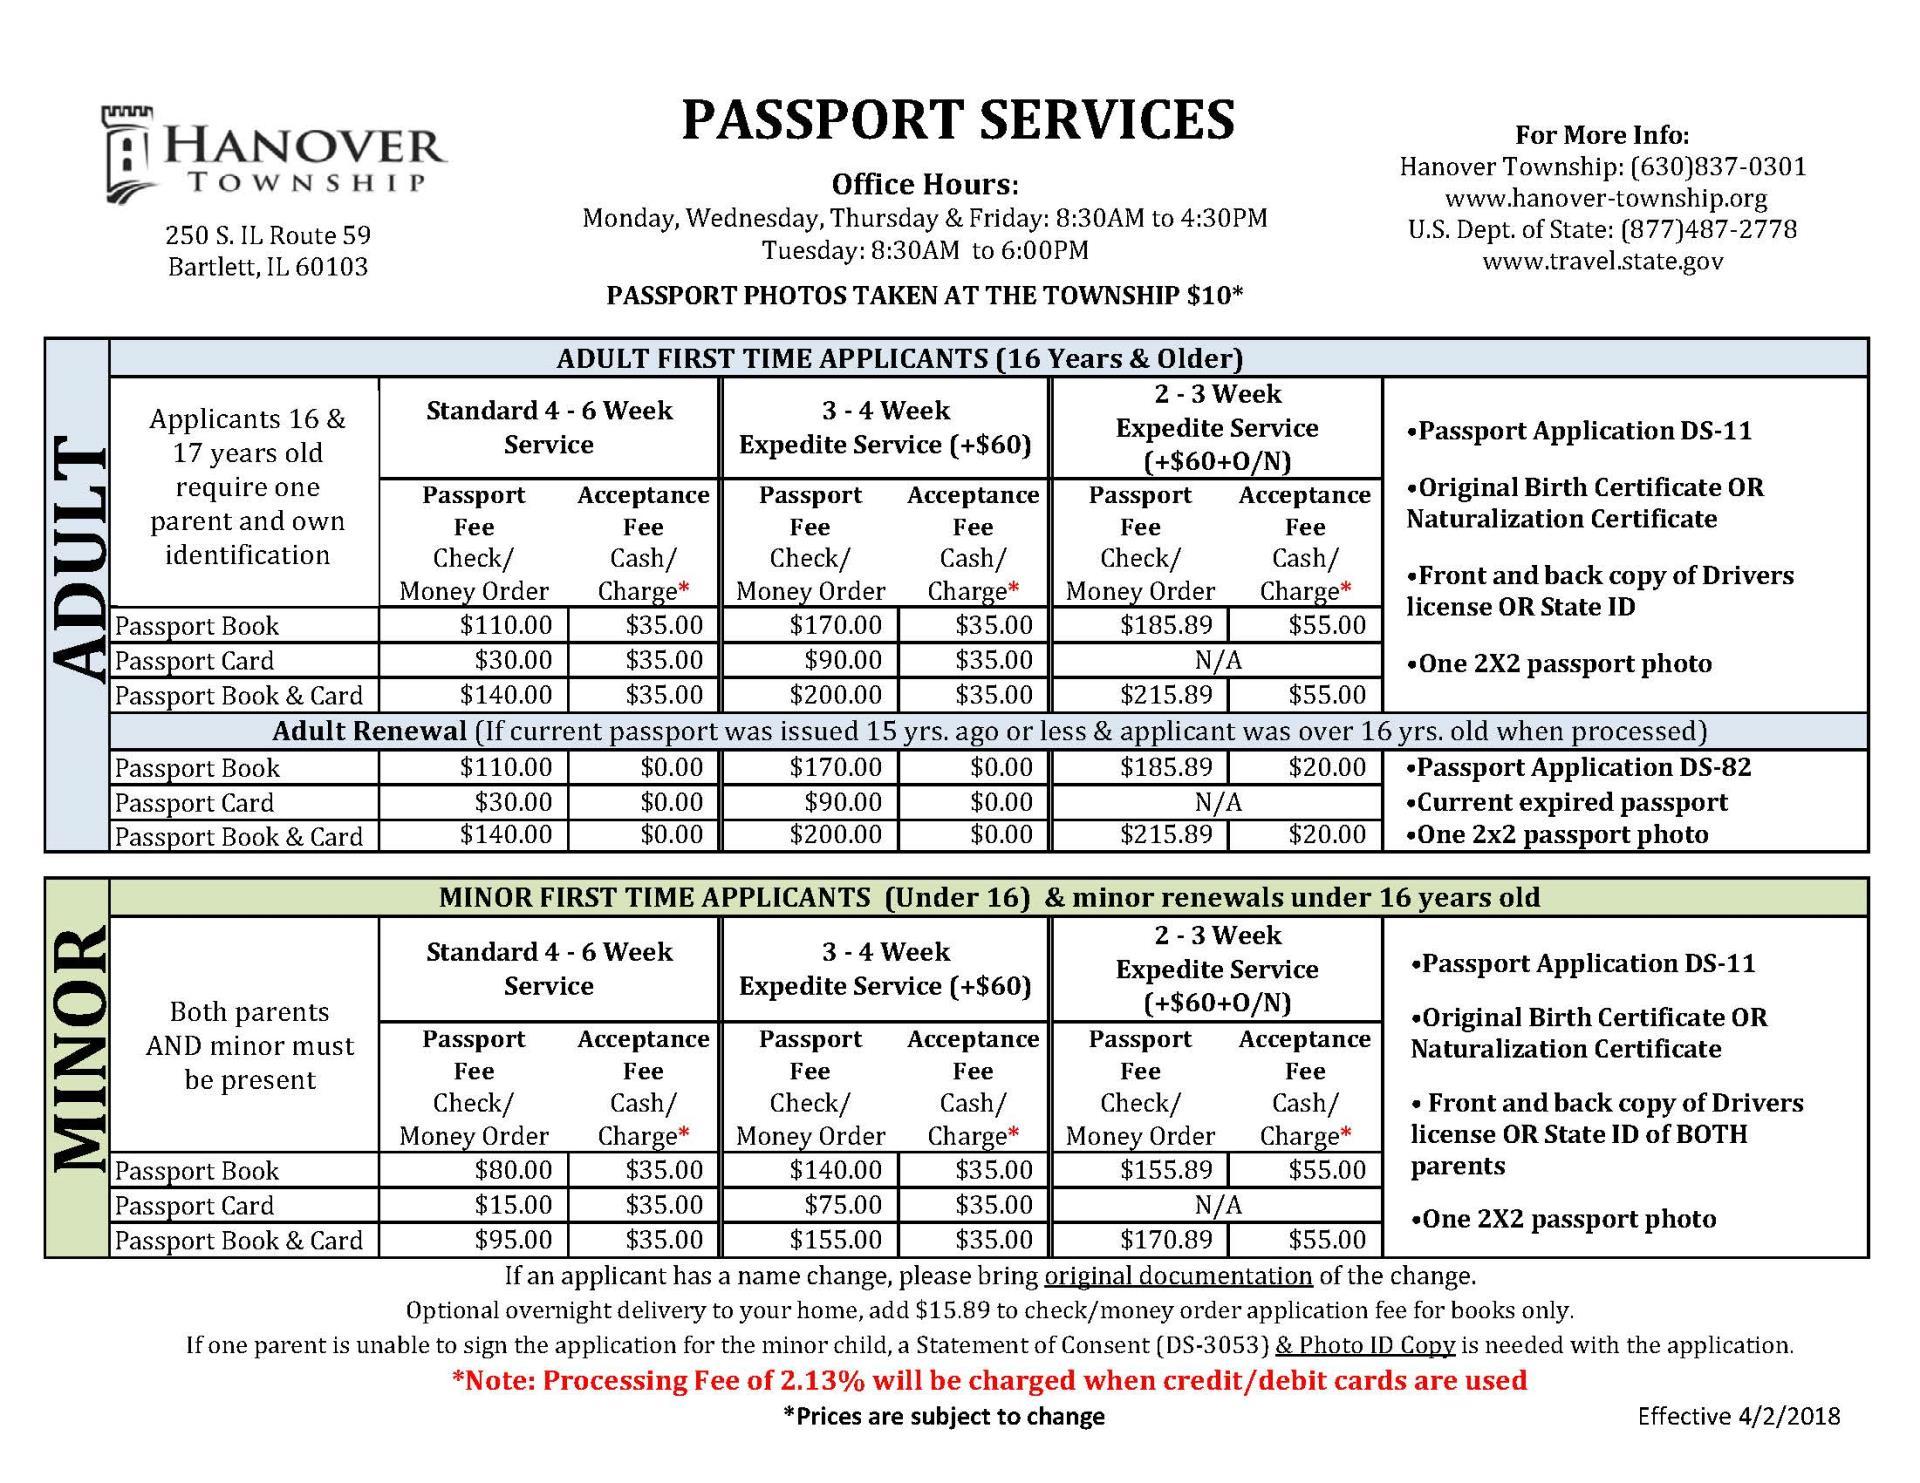 Passport Services at Hanover Township | Hanover Township, IL